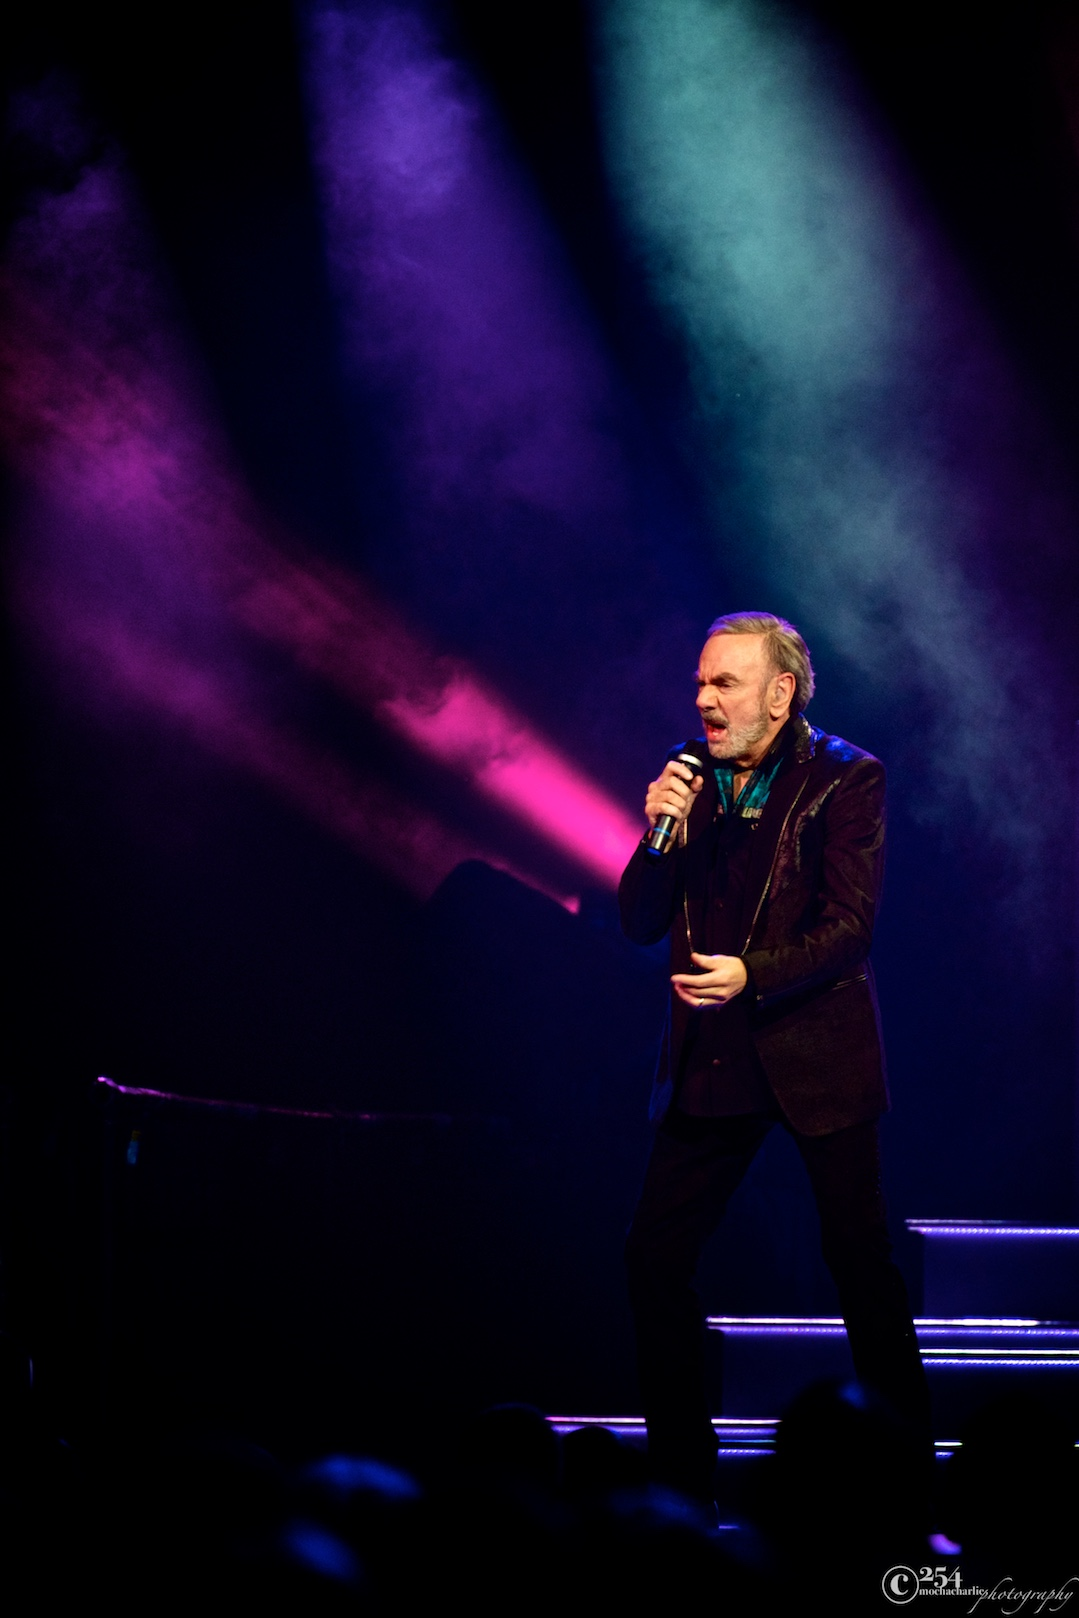 Neil Diamond at KeyArena (Photo by Mocha Charlie)